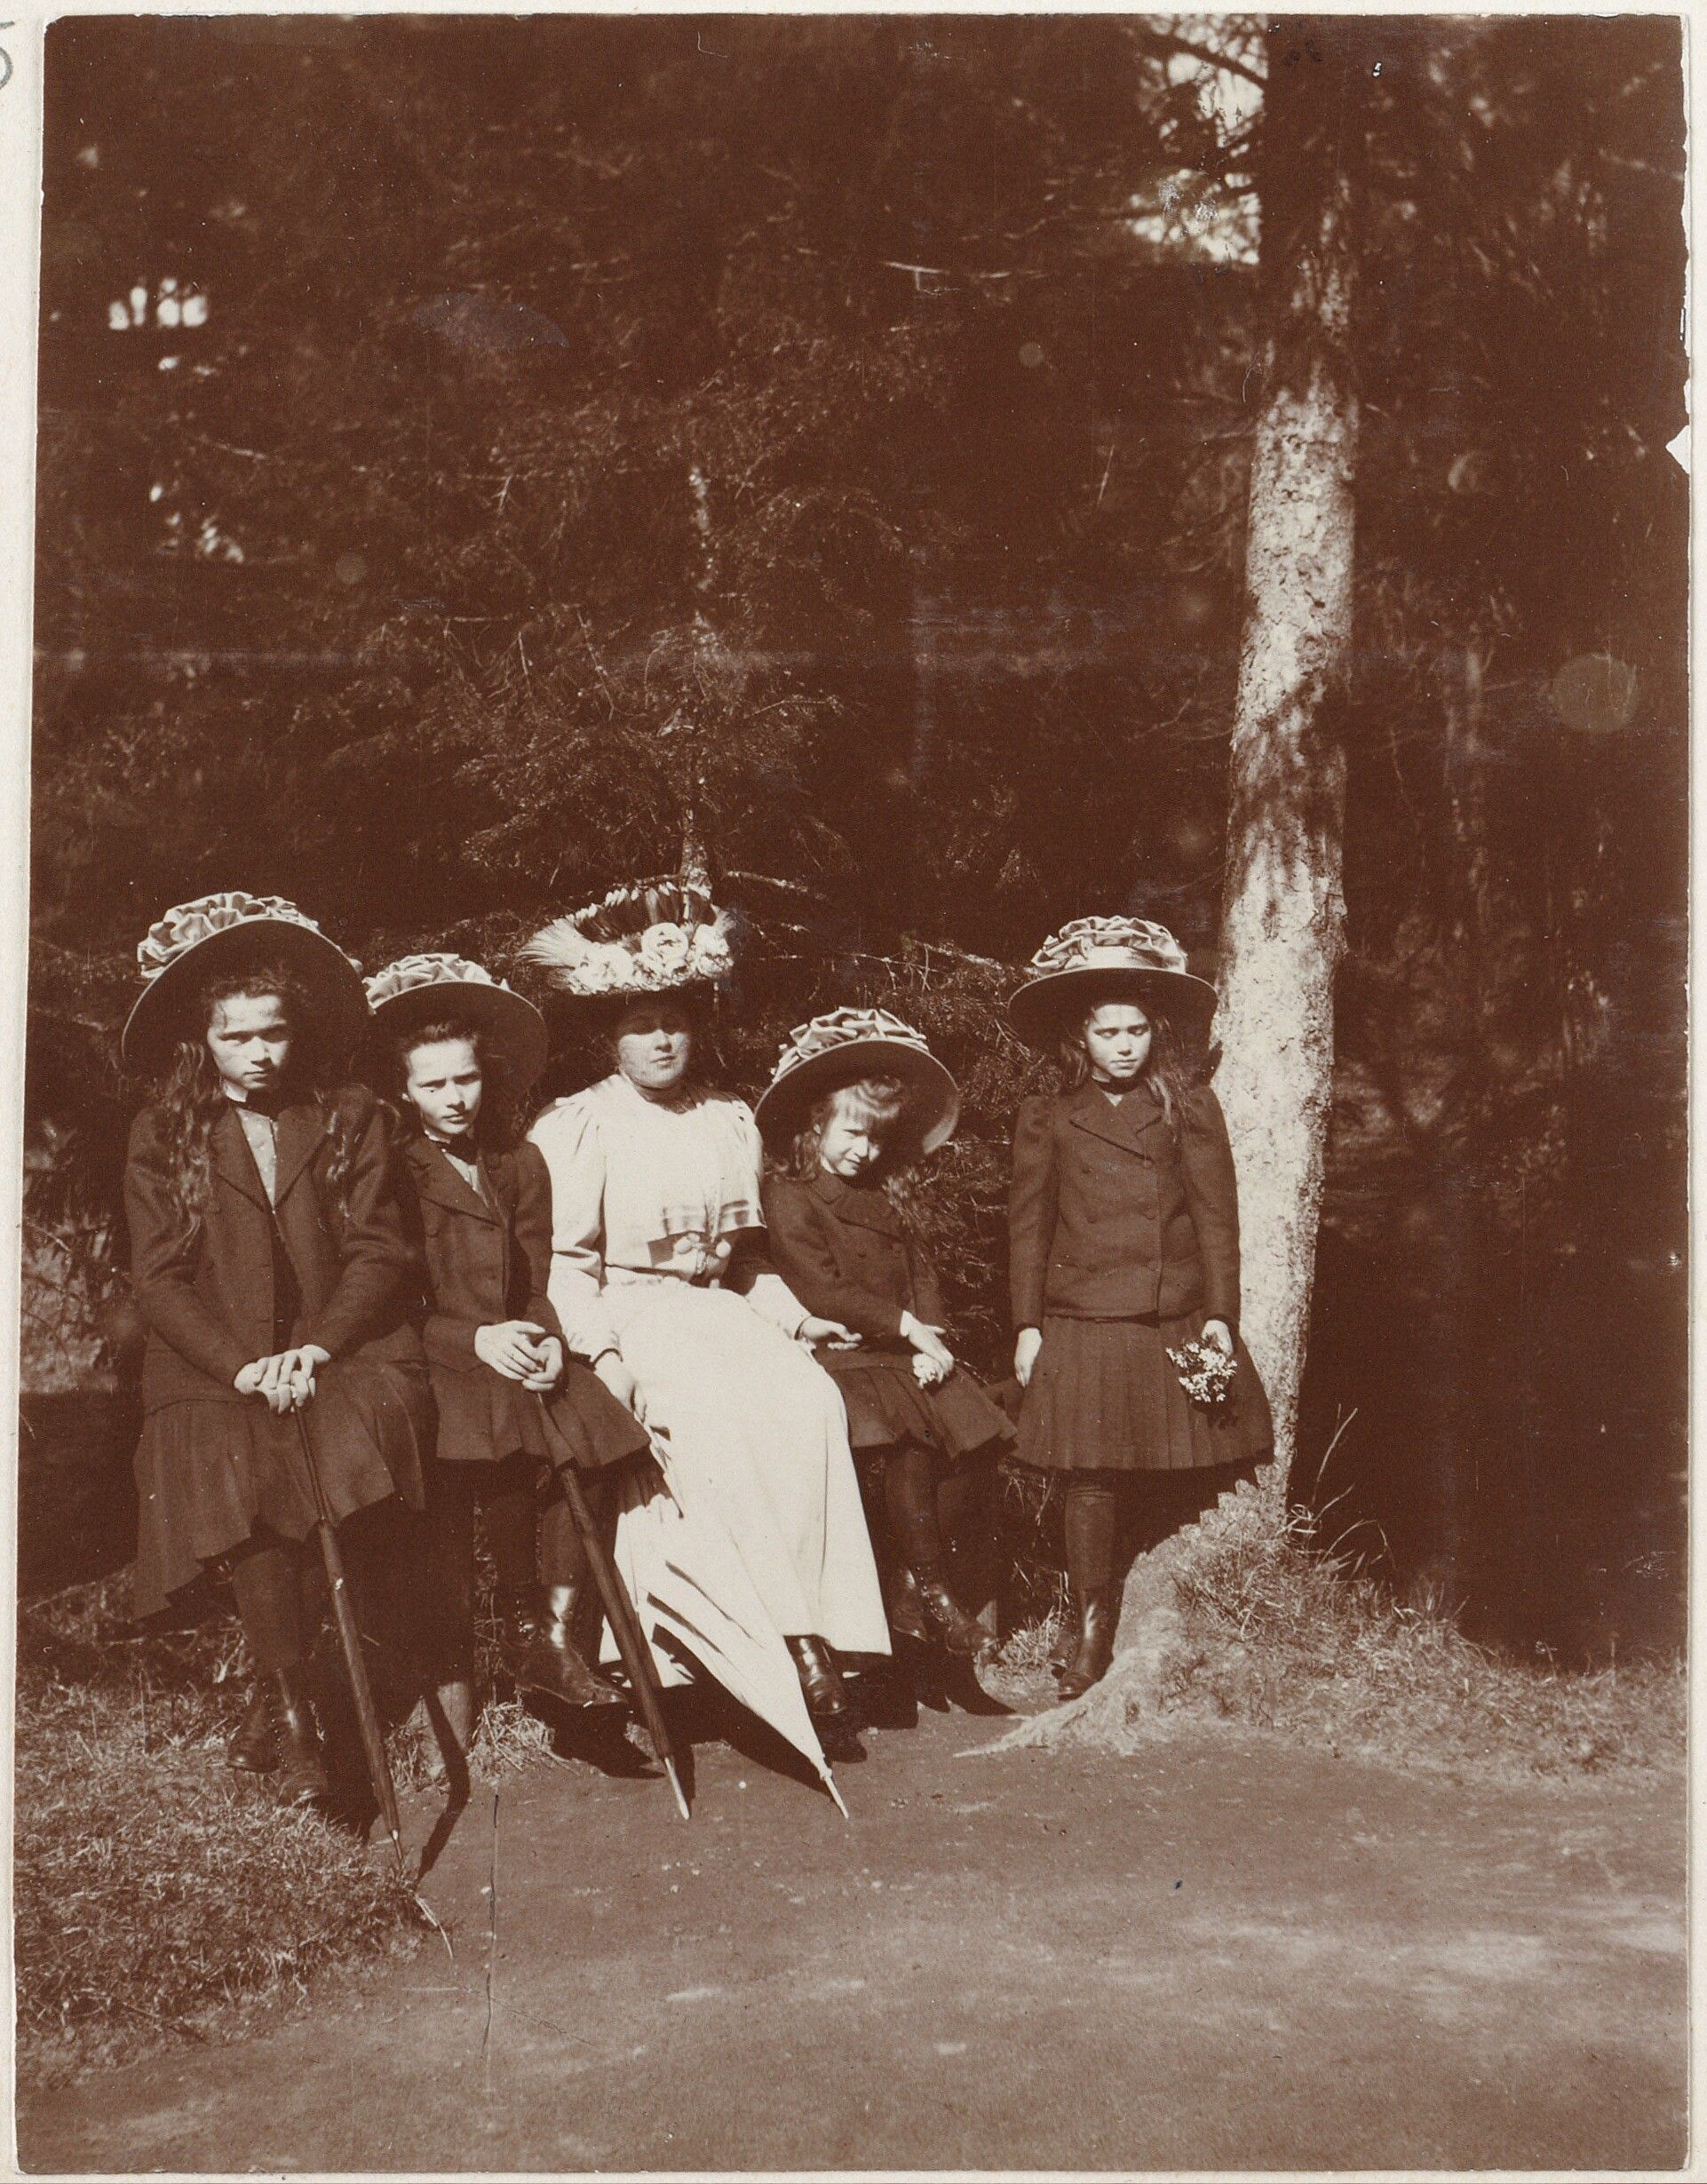 Anna Vyrubova cercada pelas Grand Duchesses Olga Nikolaevna, Tatiana Nikolaevna, Anastasia Nikolaevna e Marie Nikolevna, no Pavlovsk Park, em 1909.